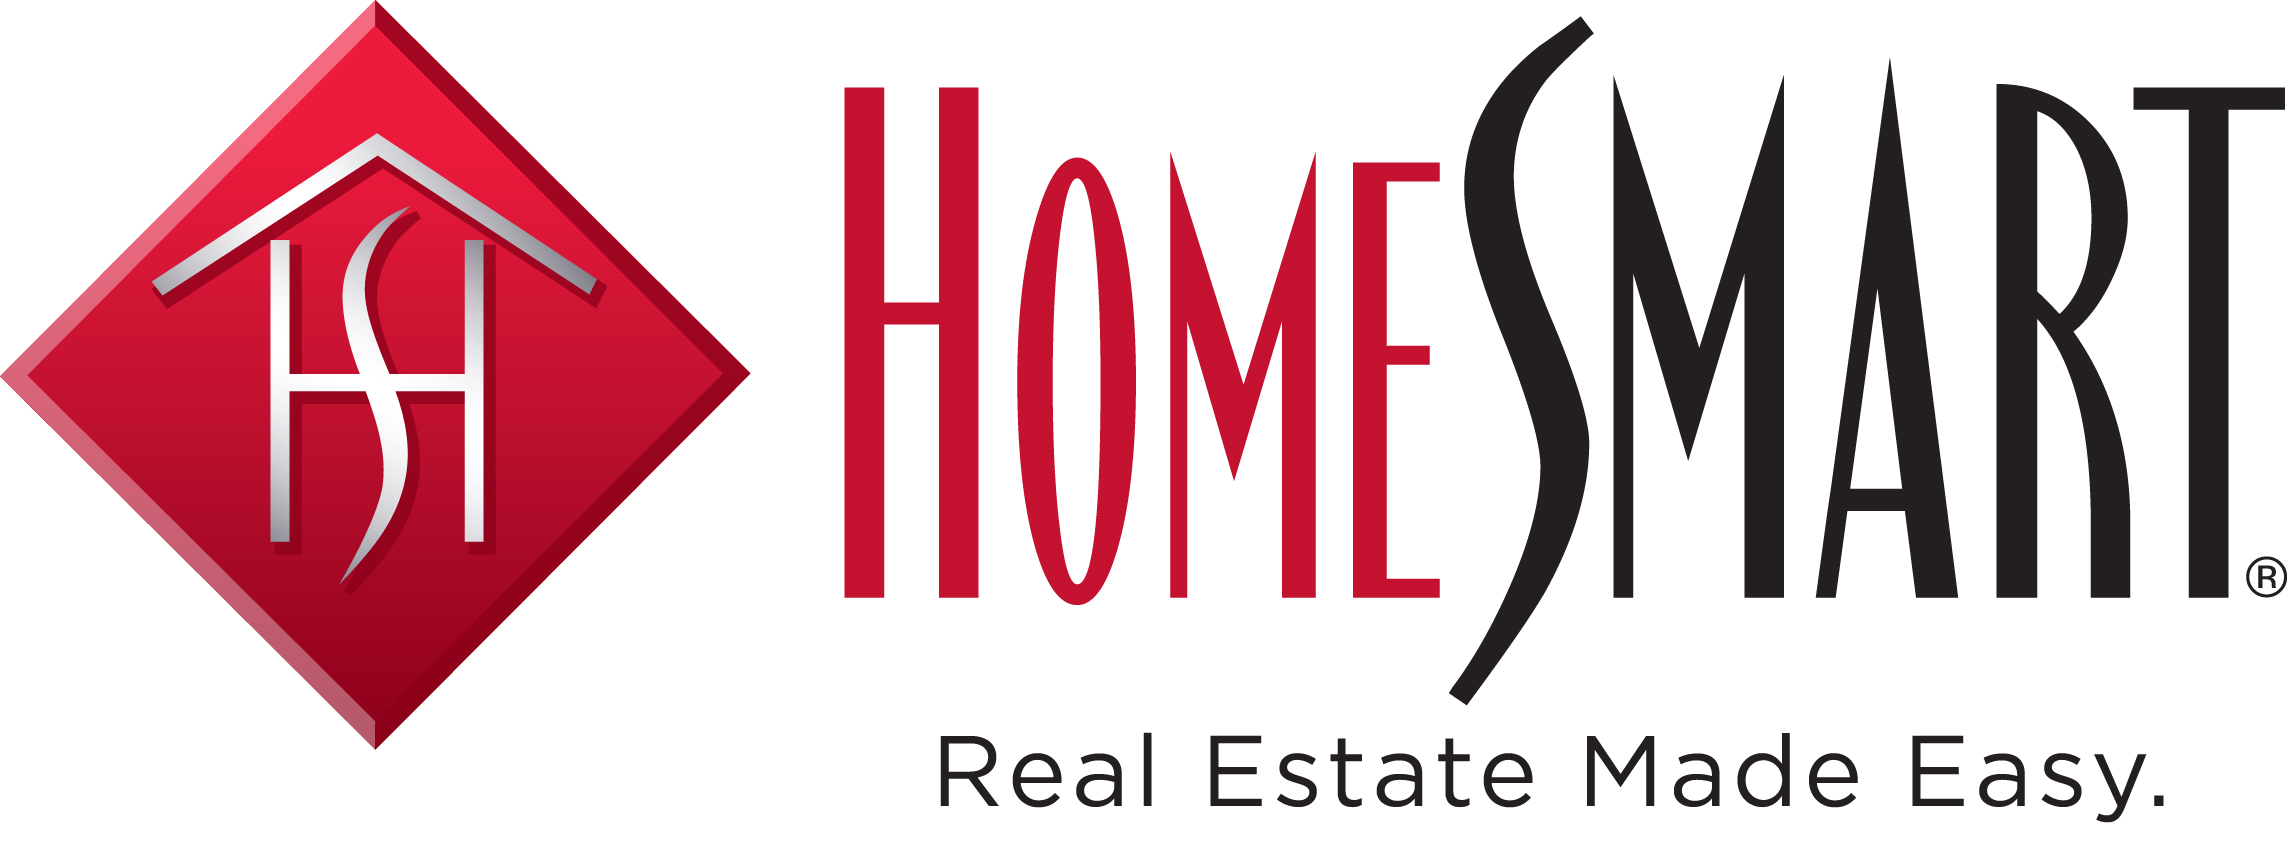 HomeSmart Realty West